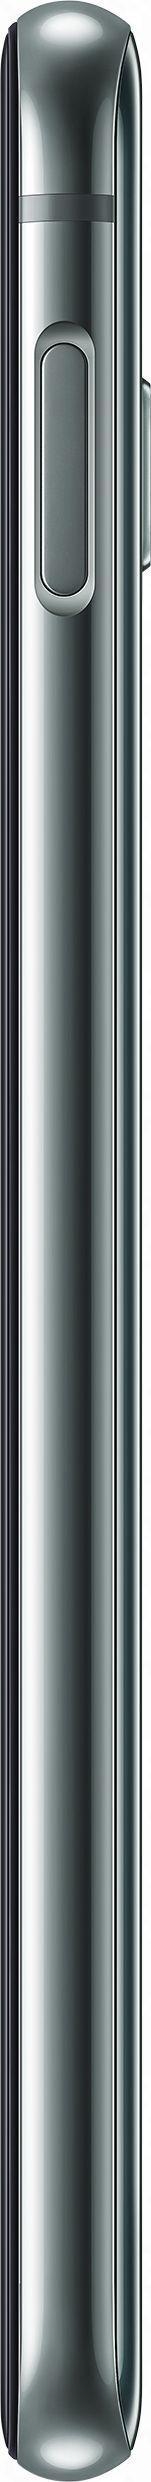 Samsung Galaxy S10e 128GB - Prism Green (SM-G970FZGDXEO)